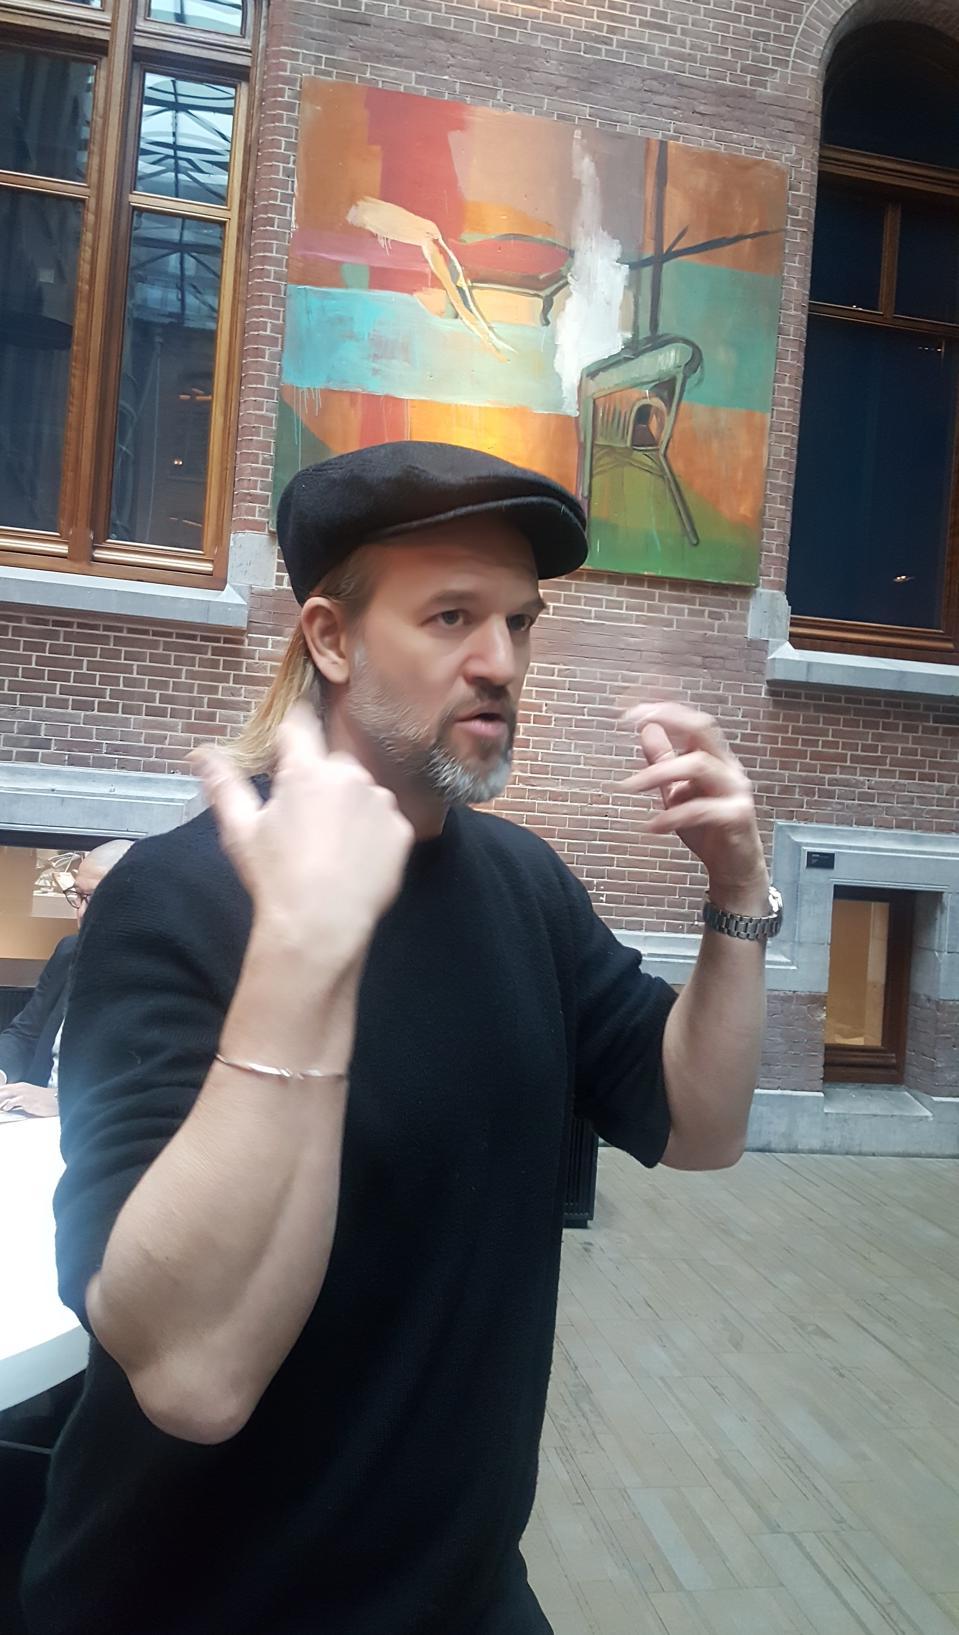 Amsterdam artist Jasper Krabbé at the Conservatorium Hotel where his paintings feature